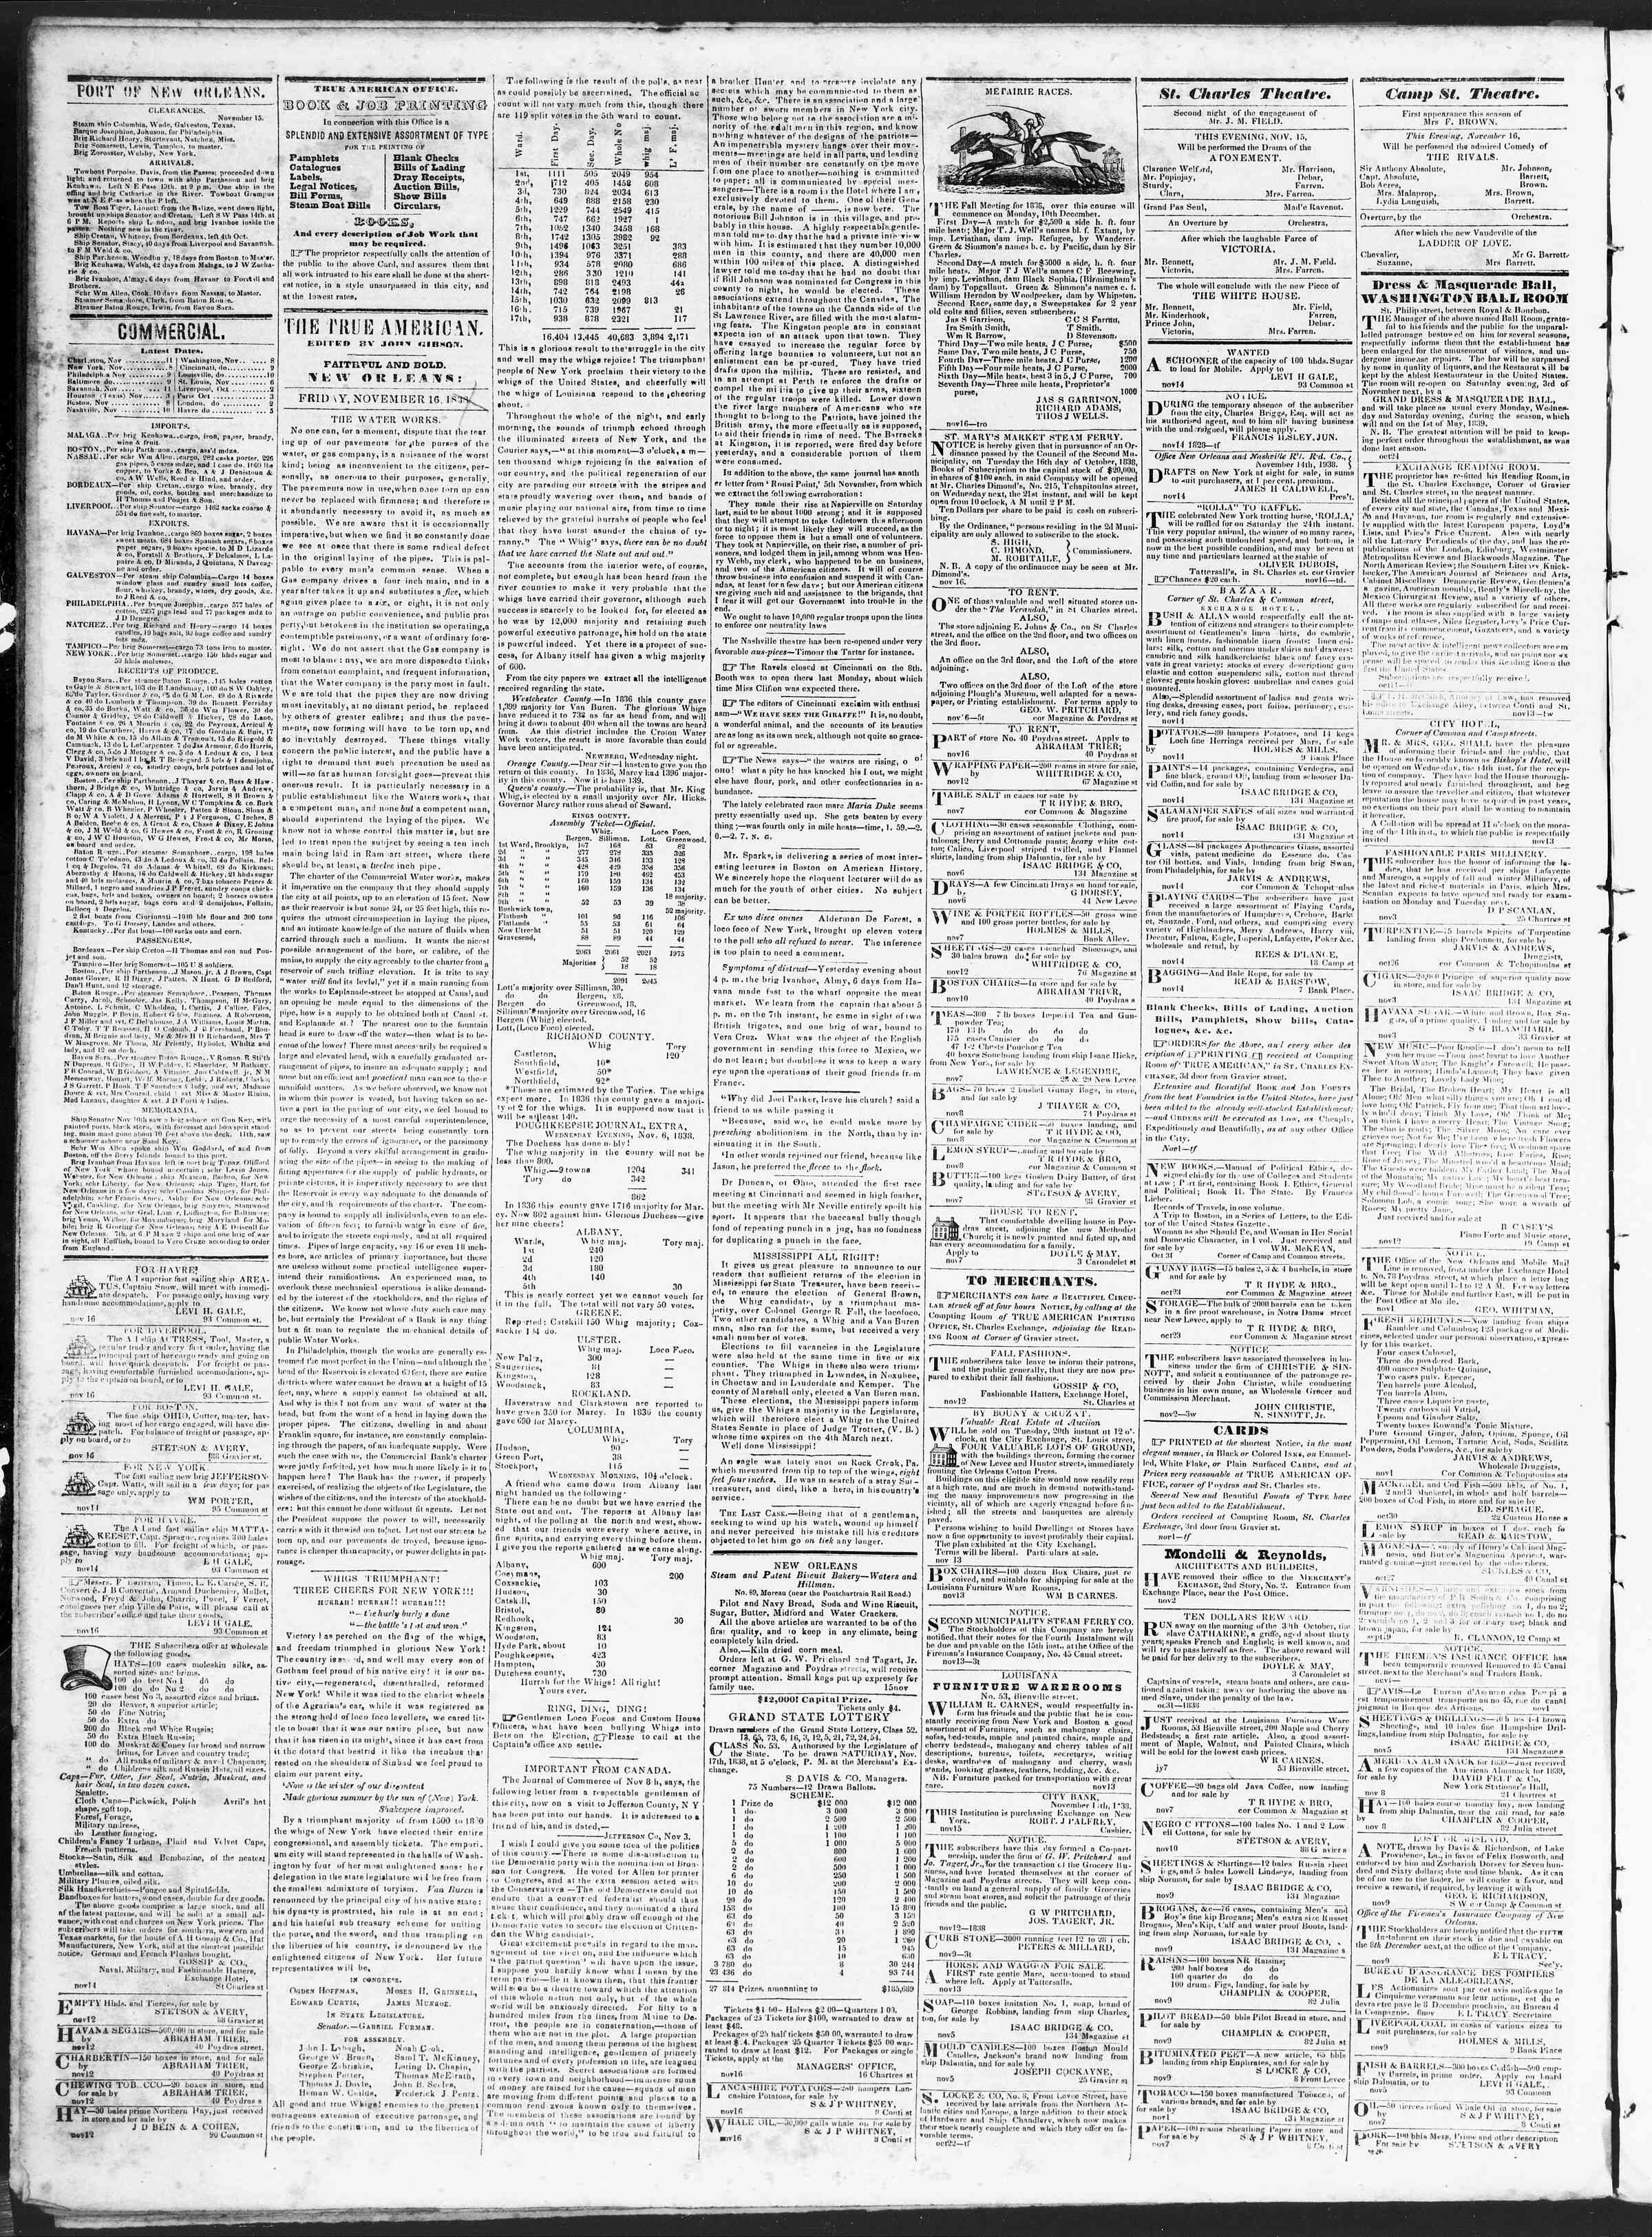 November 16, 1838 Tarihli True American Gazetesi Sayfa 2